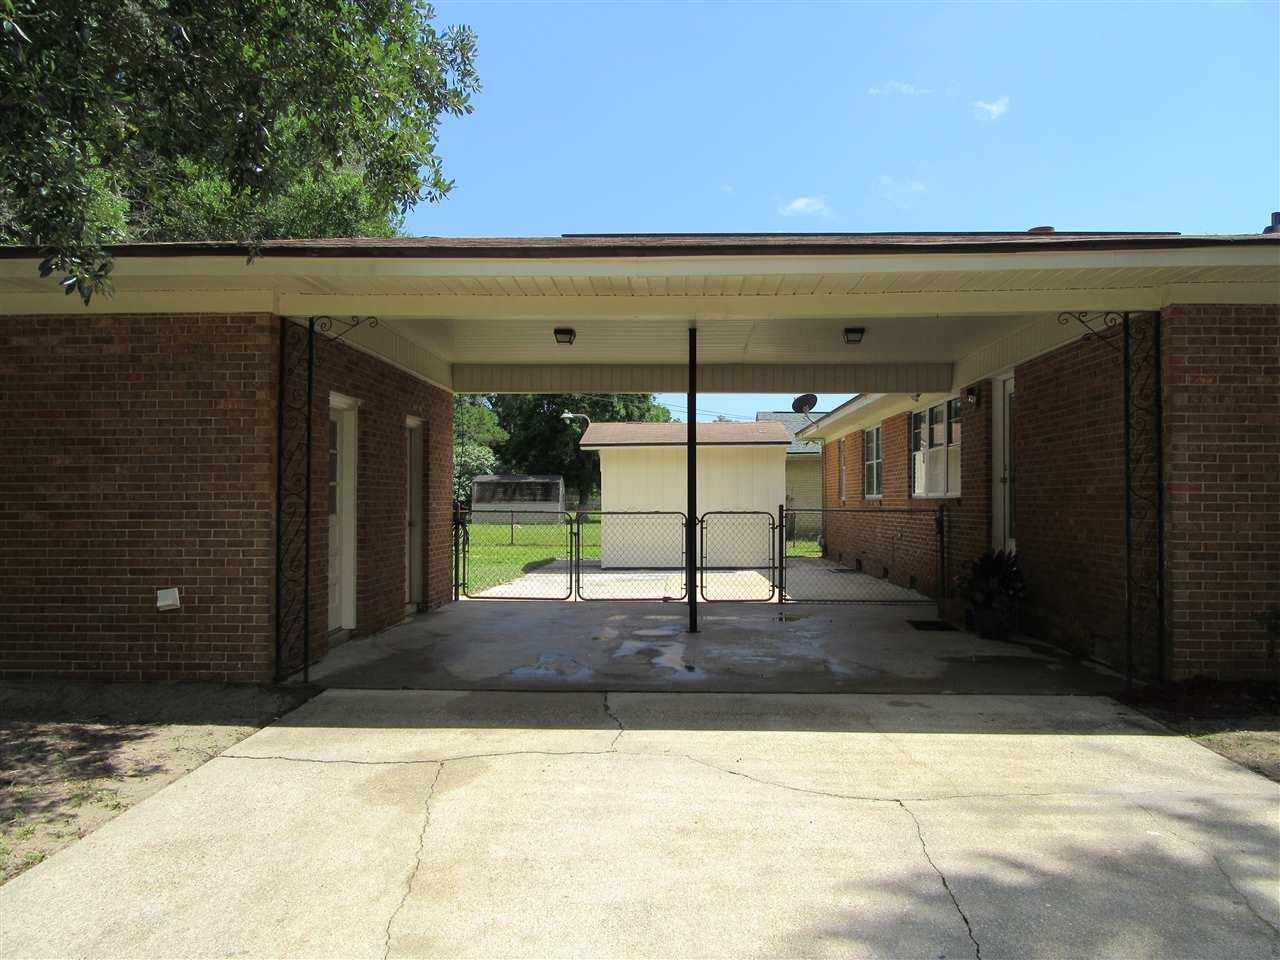 20 Campbellton Ln, Pensacola, FL 32506